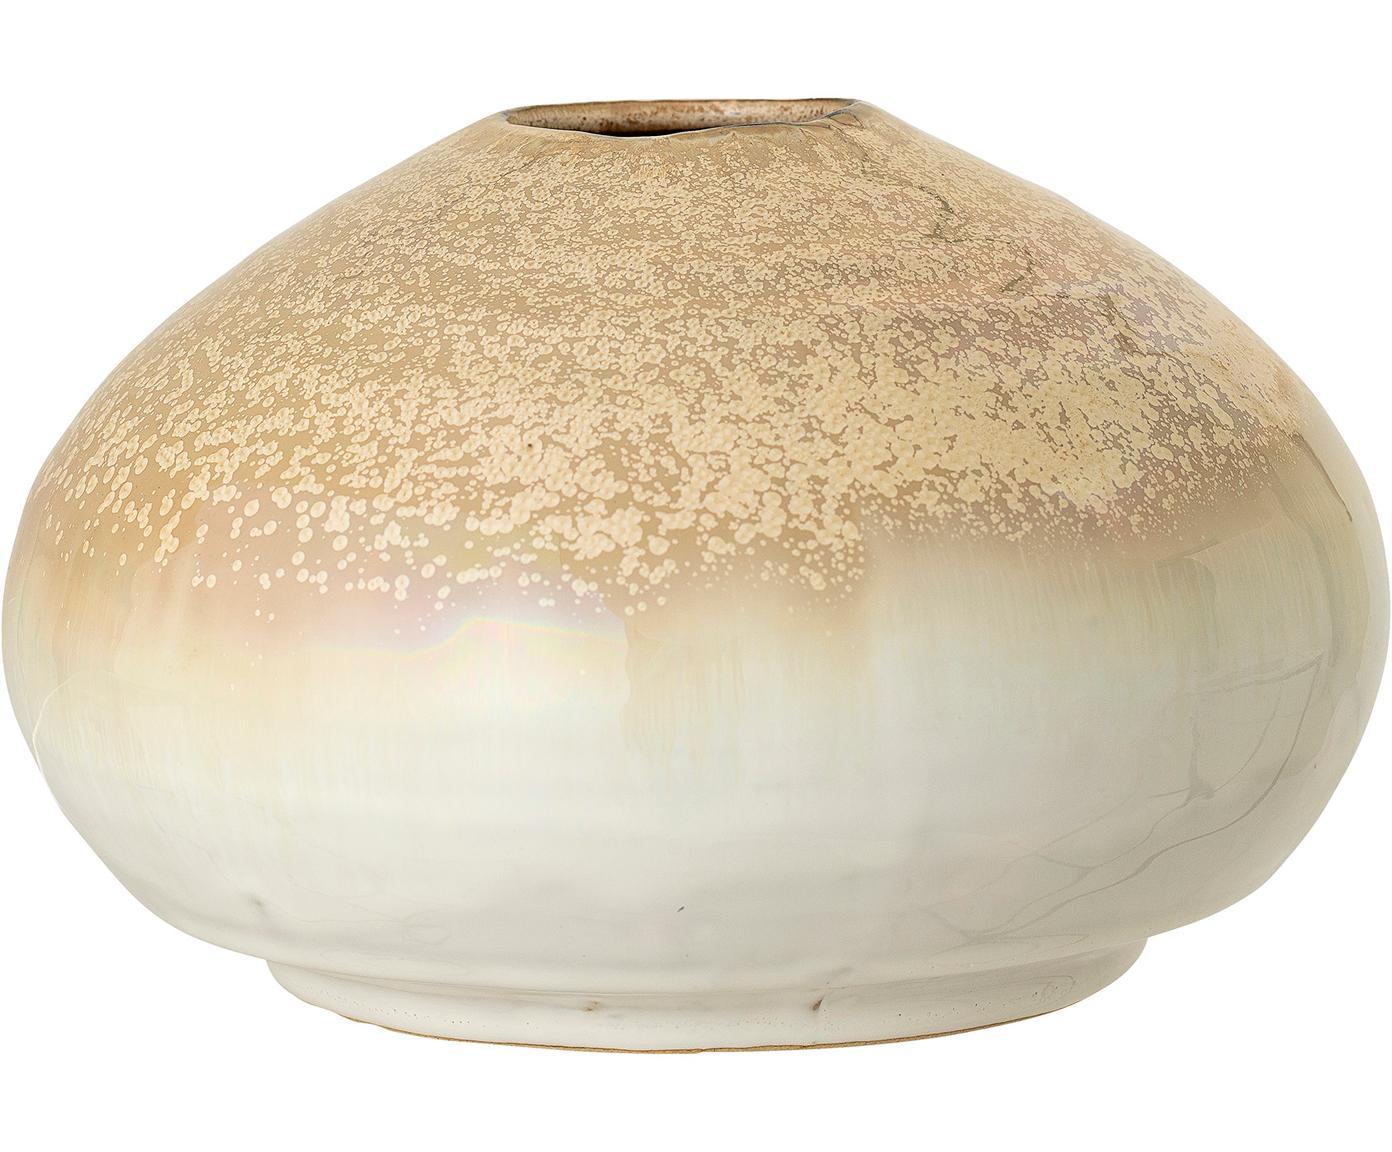 Vaso in terracotta fatto a mano Nina, Gres, Beige, Ø 12 x Alt. 8 cm